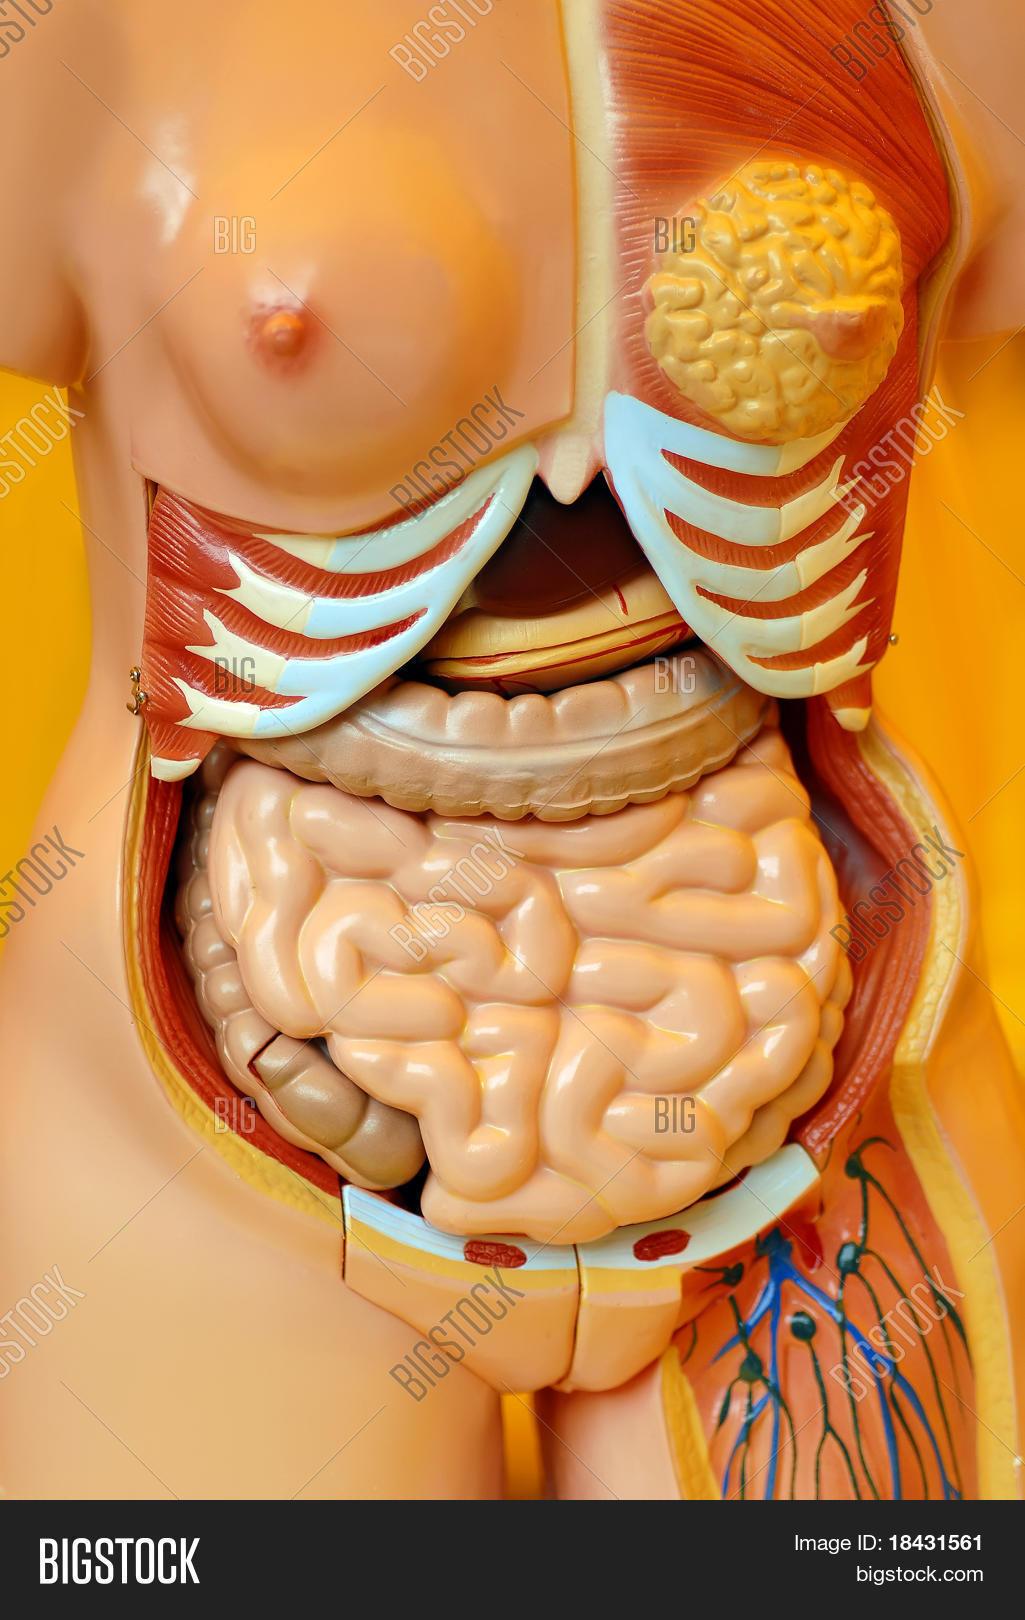 Organs Inside Female Image Photo Free Trial Bigstock